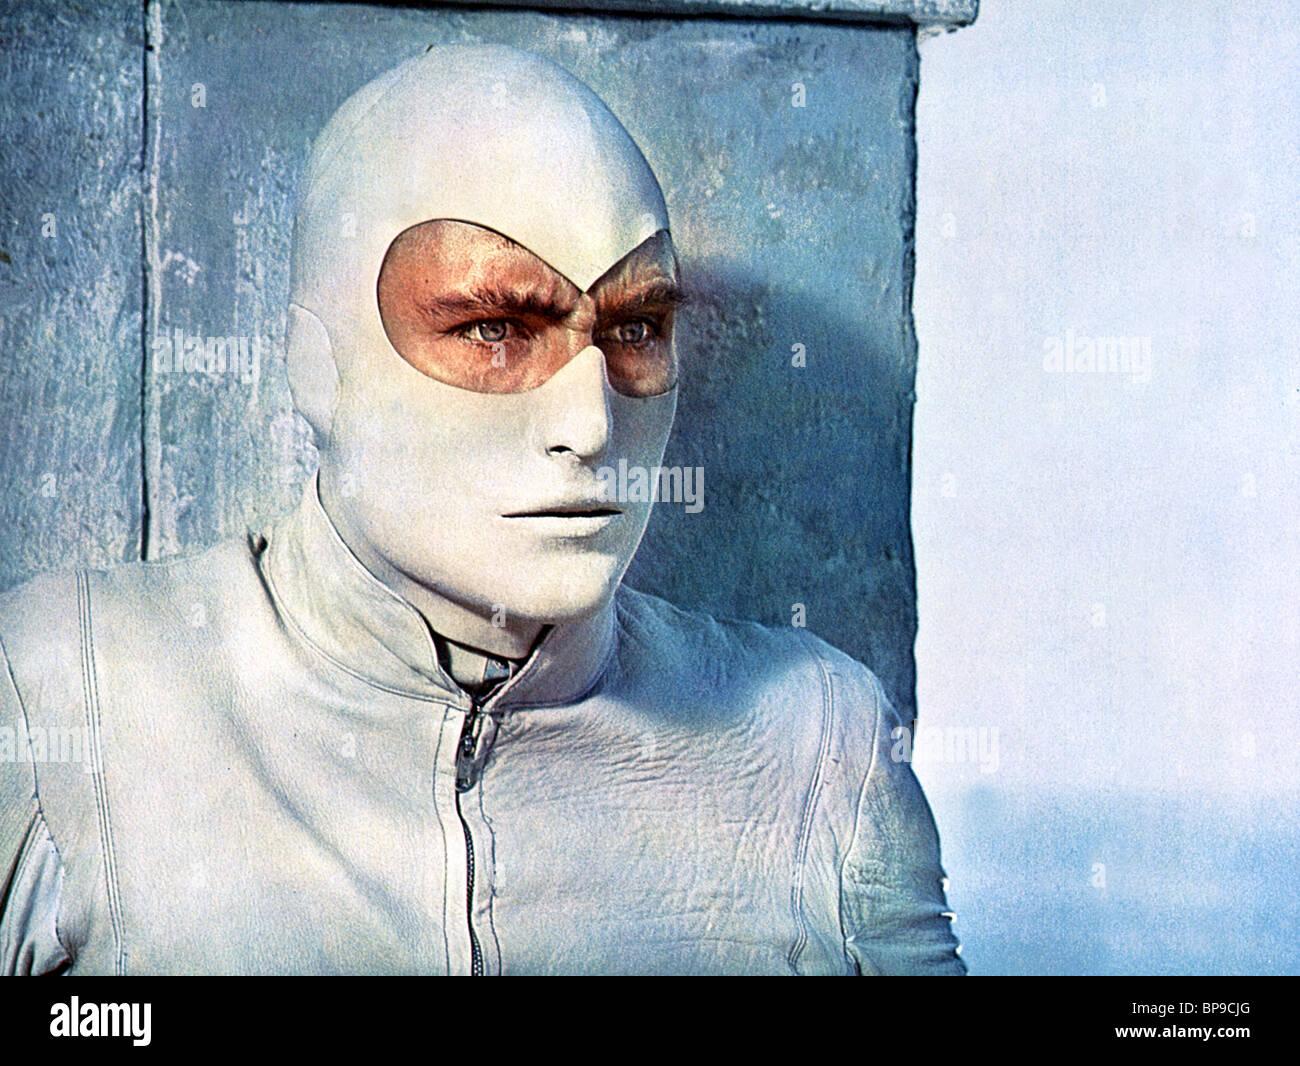 JOHN PHILLIP LAW DIABOLIK (1968) - Stock Image